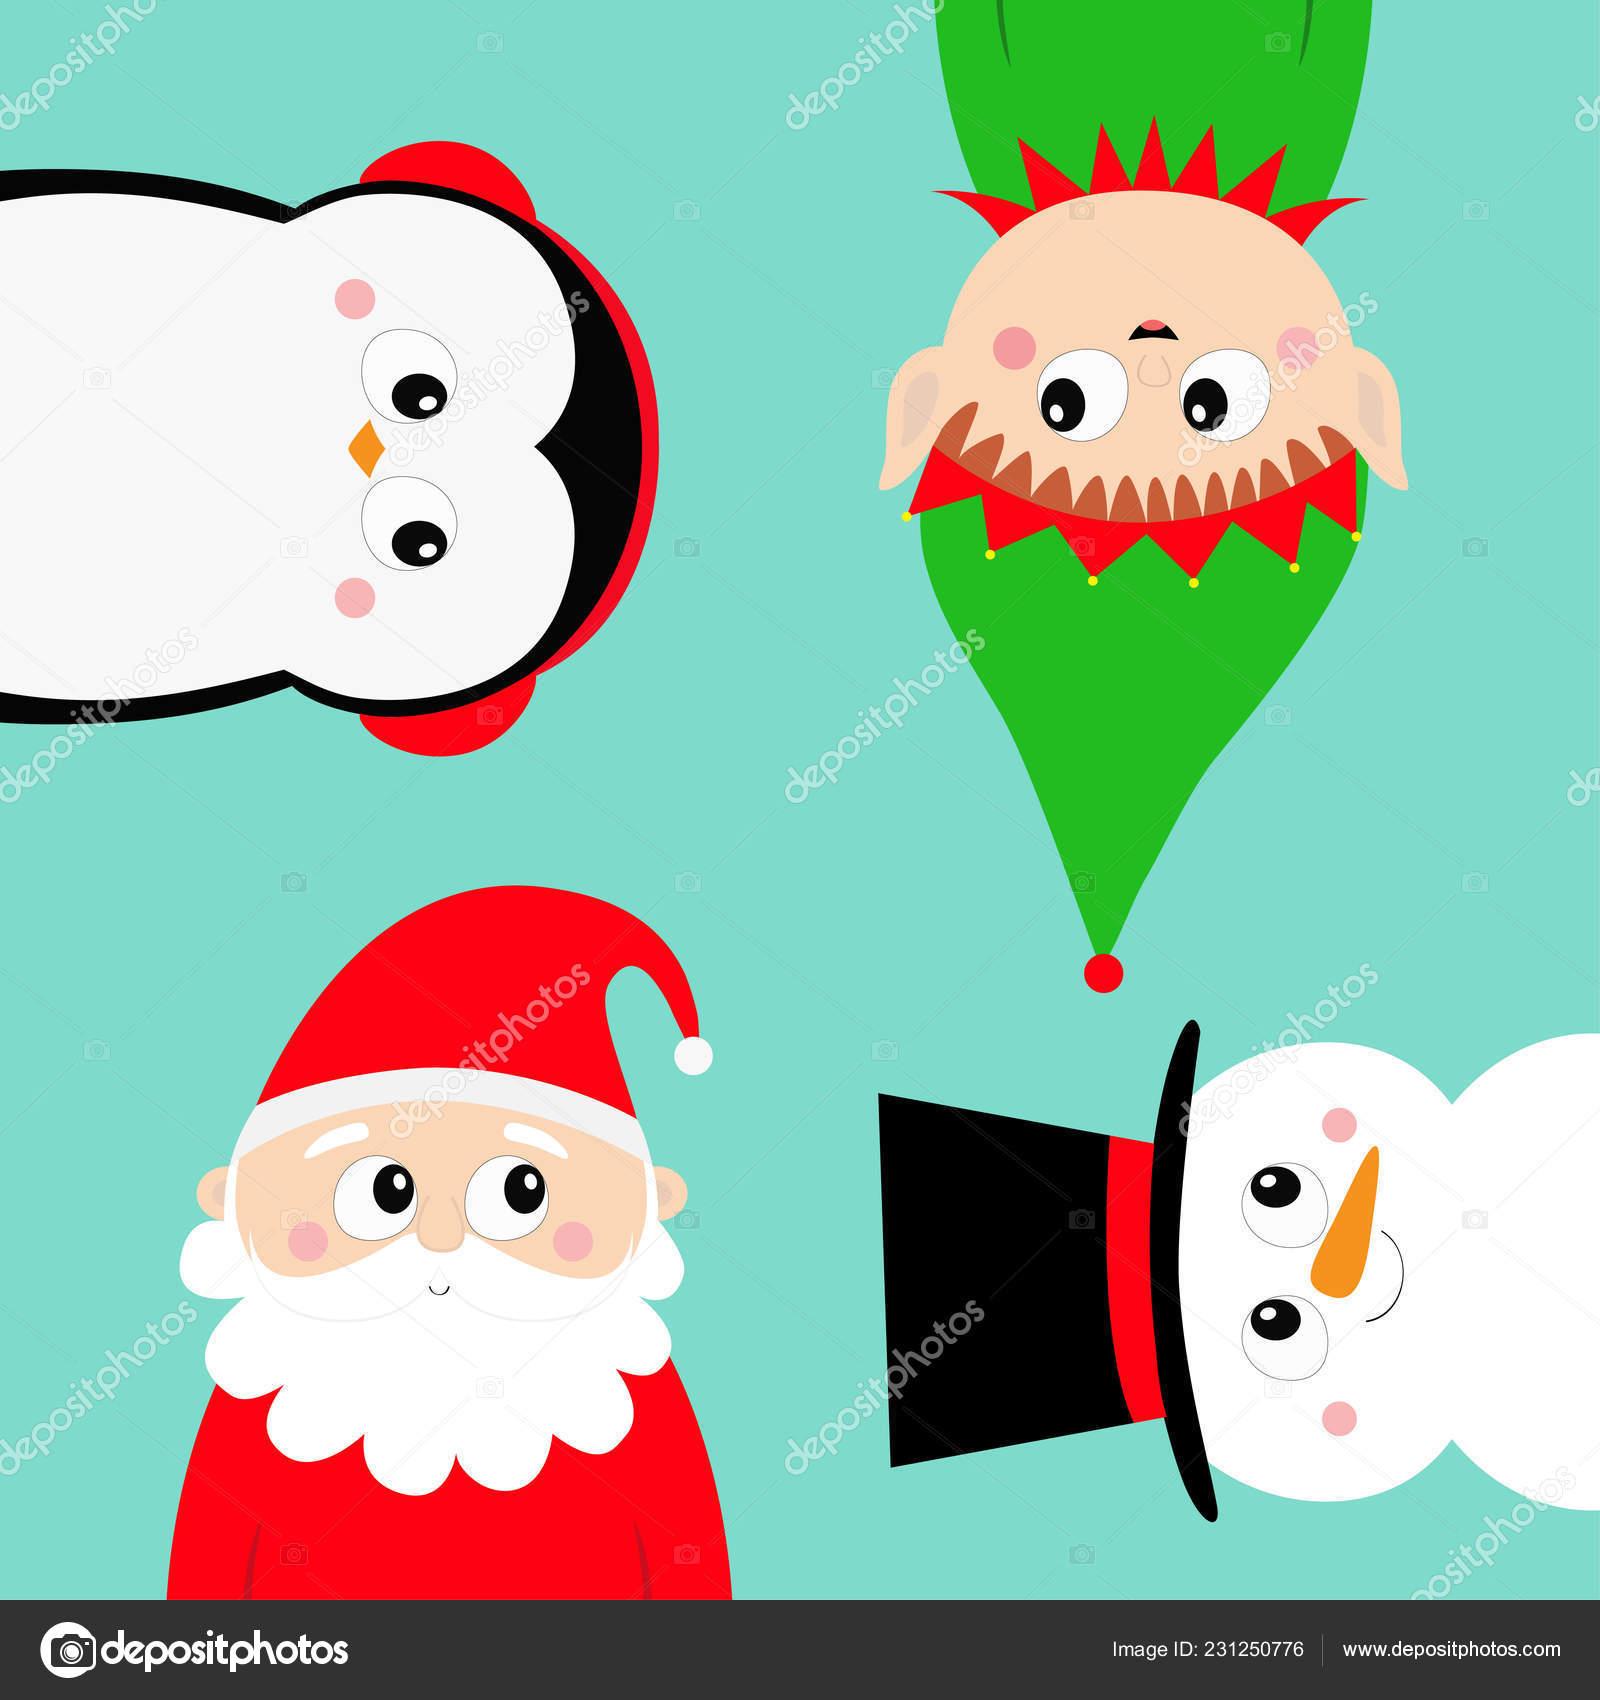 Joyeux Noël Nouvel Lutin Père Noël Bonhomme Neige Pingouin